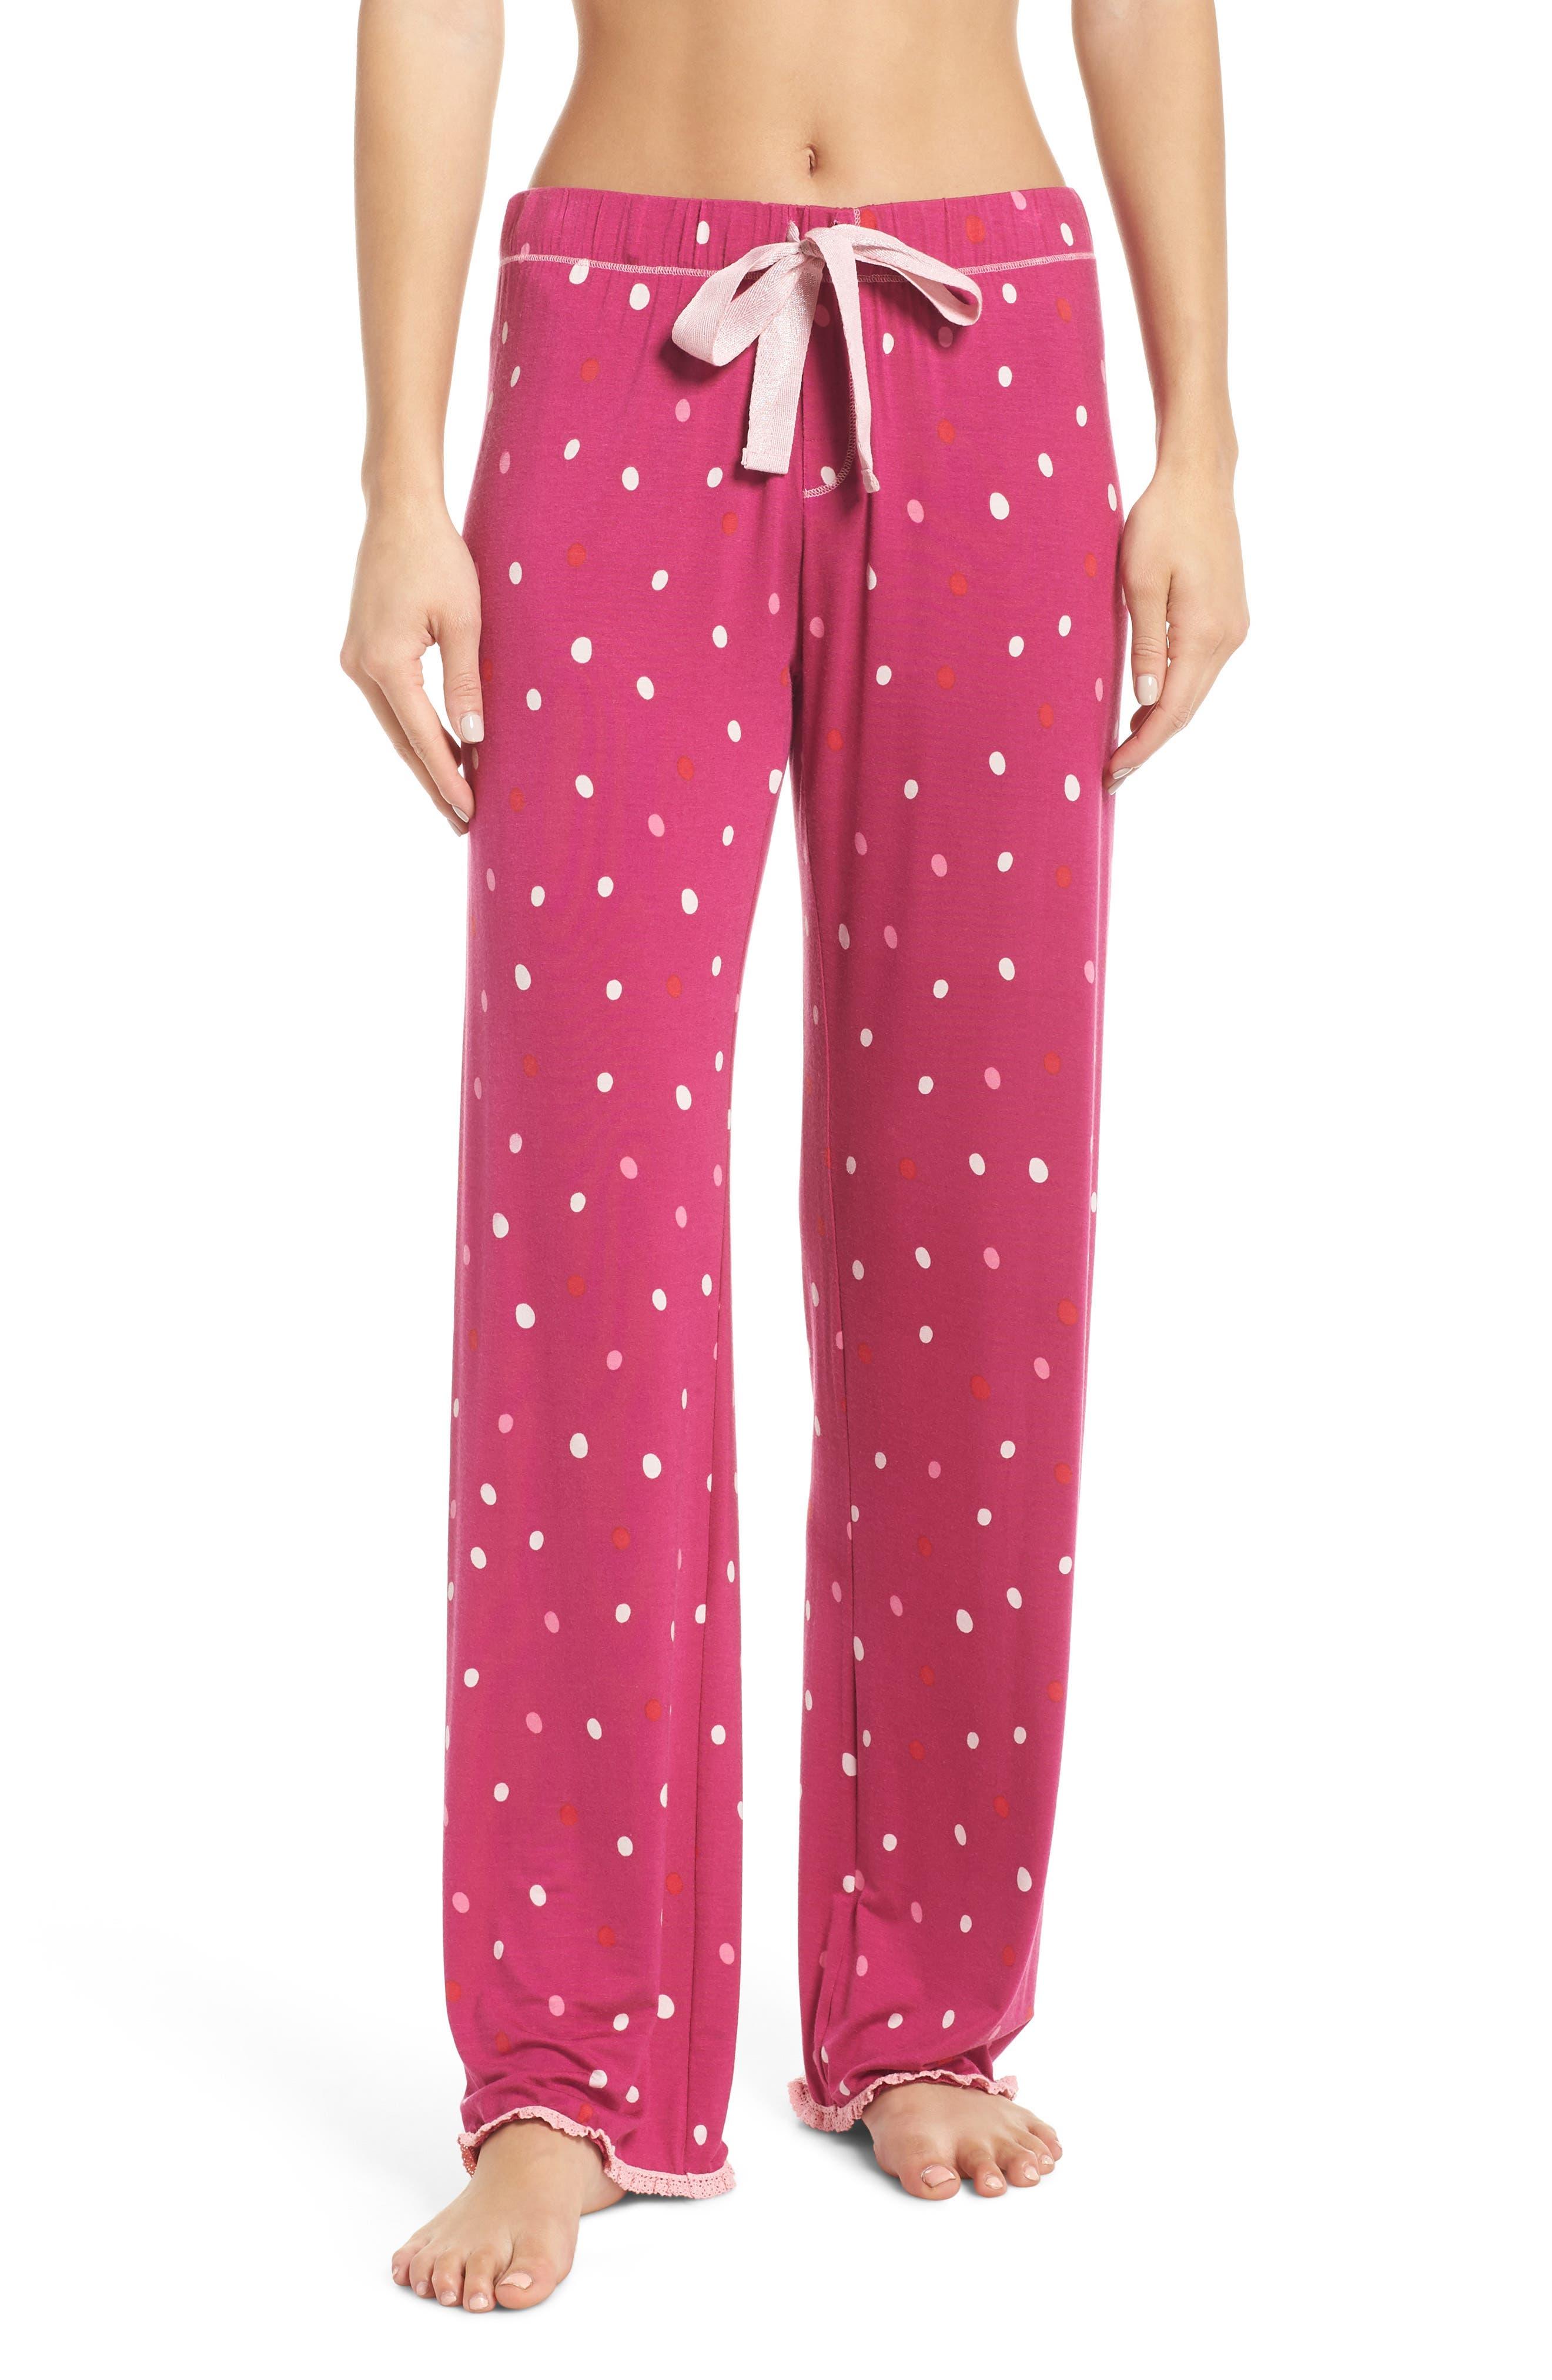 Hatley Cozy Pajama Pants, Pink